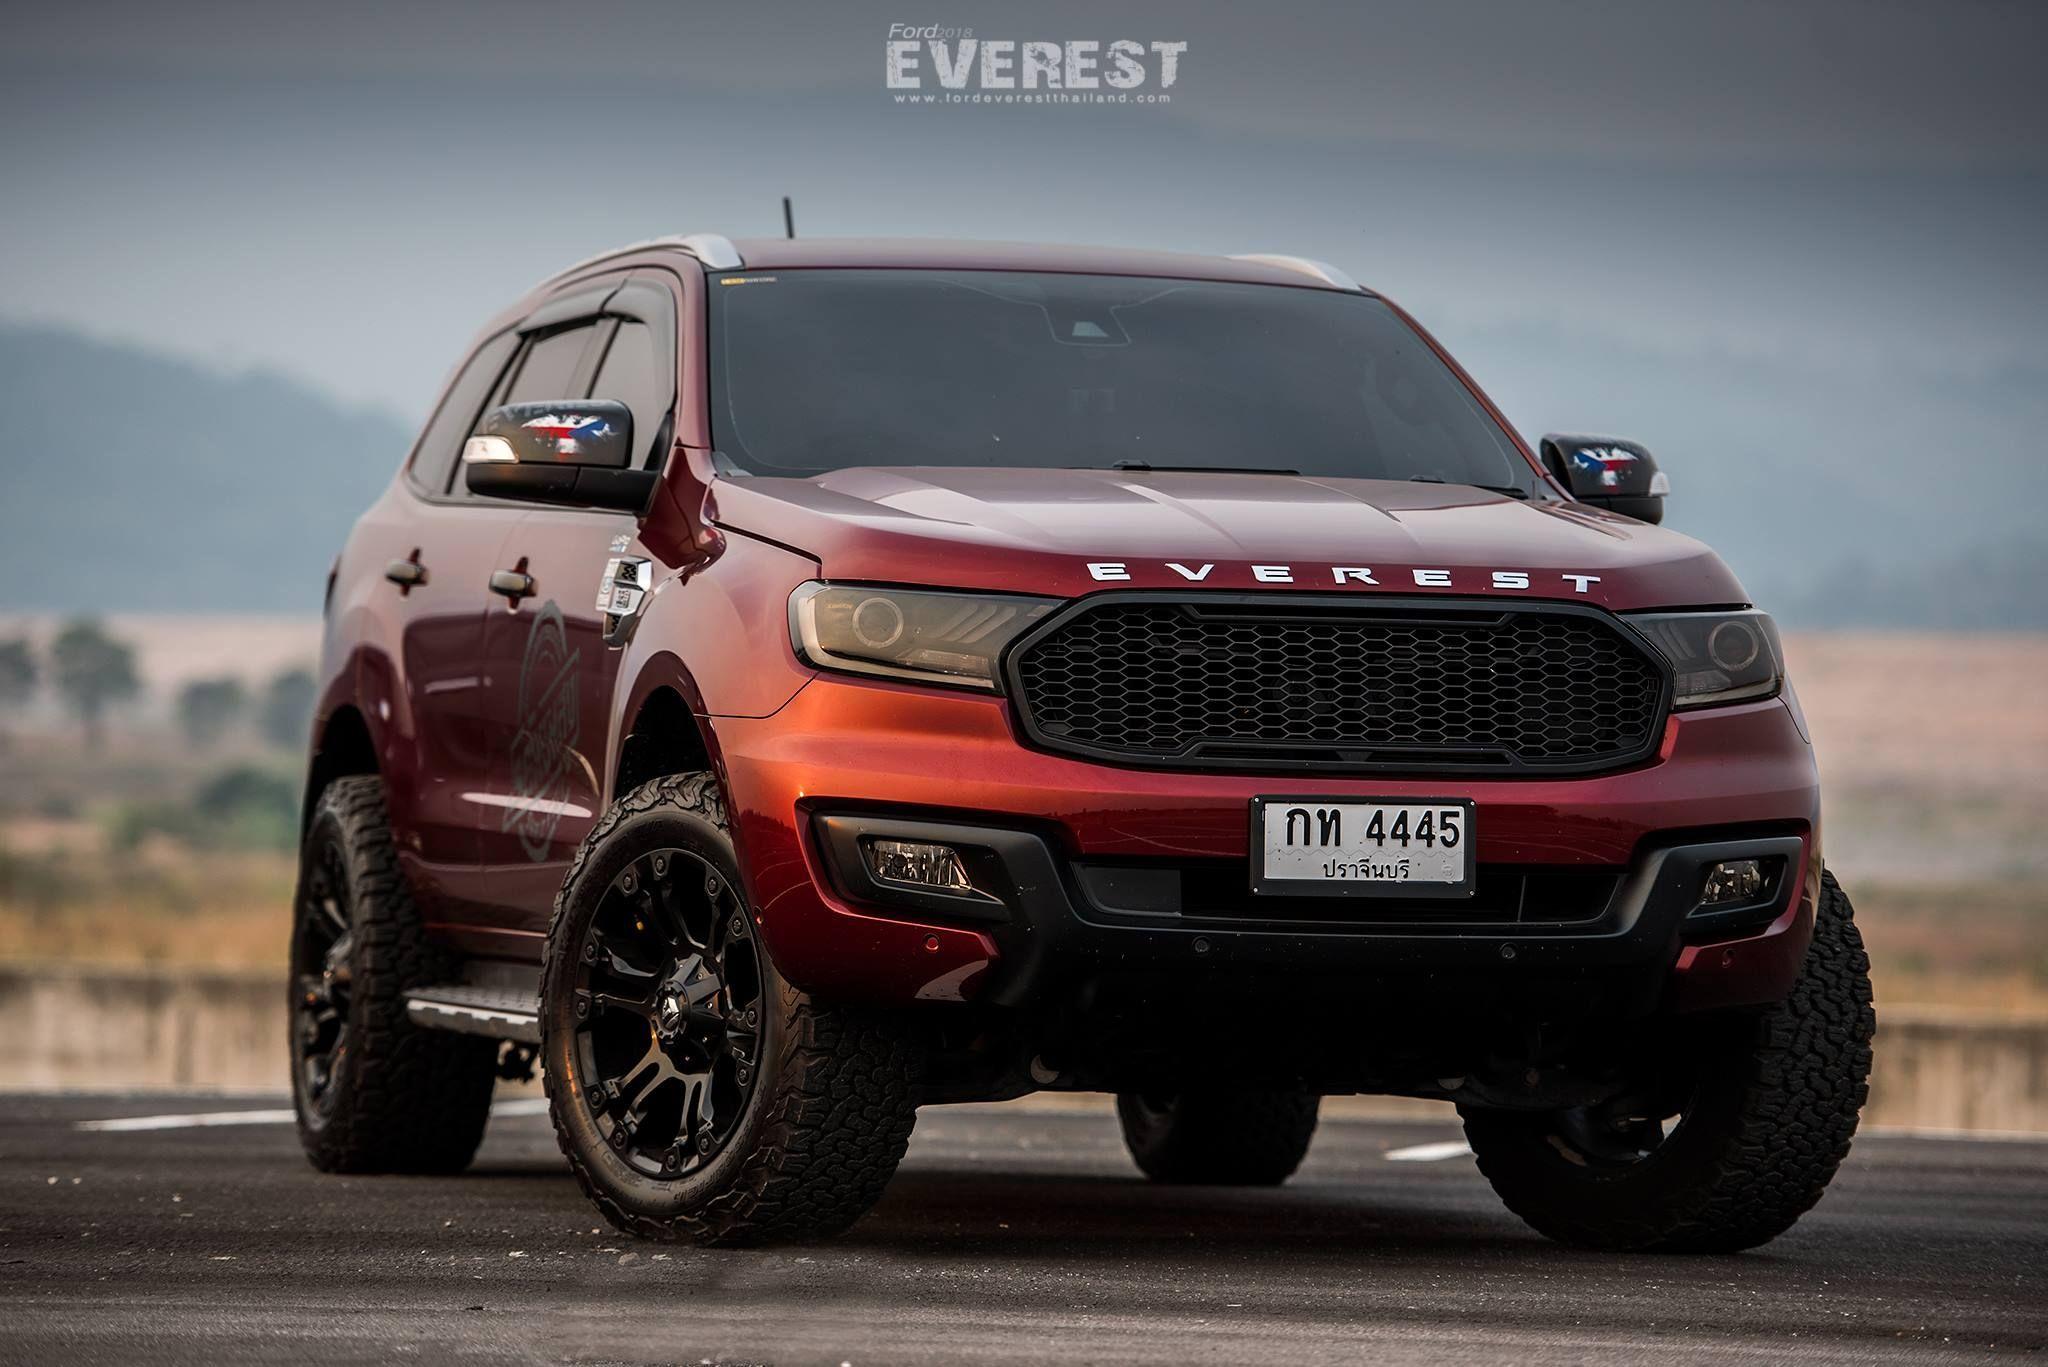 10 Prodigious Alloy Wheels Ideas Car Wheels Ford Endeavour Ford Trucks